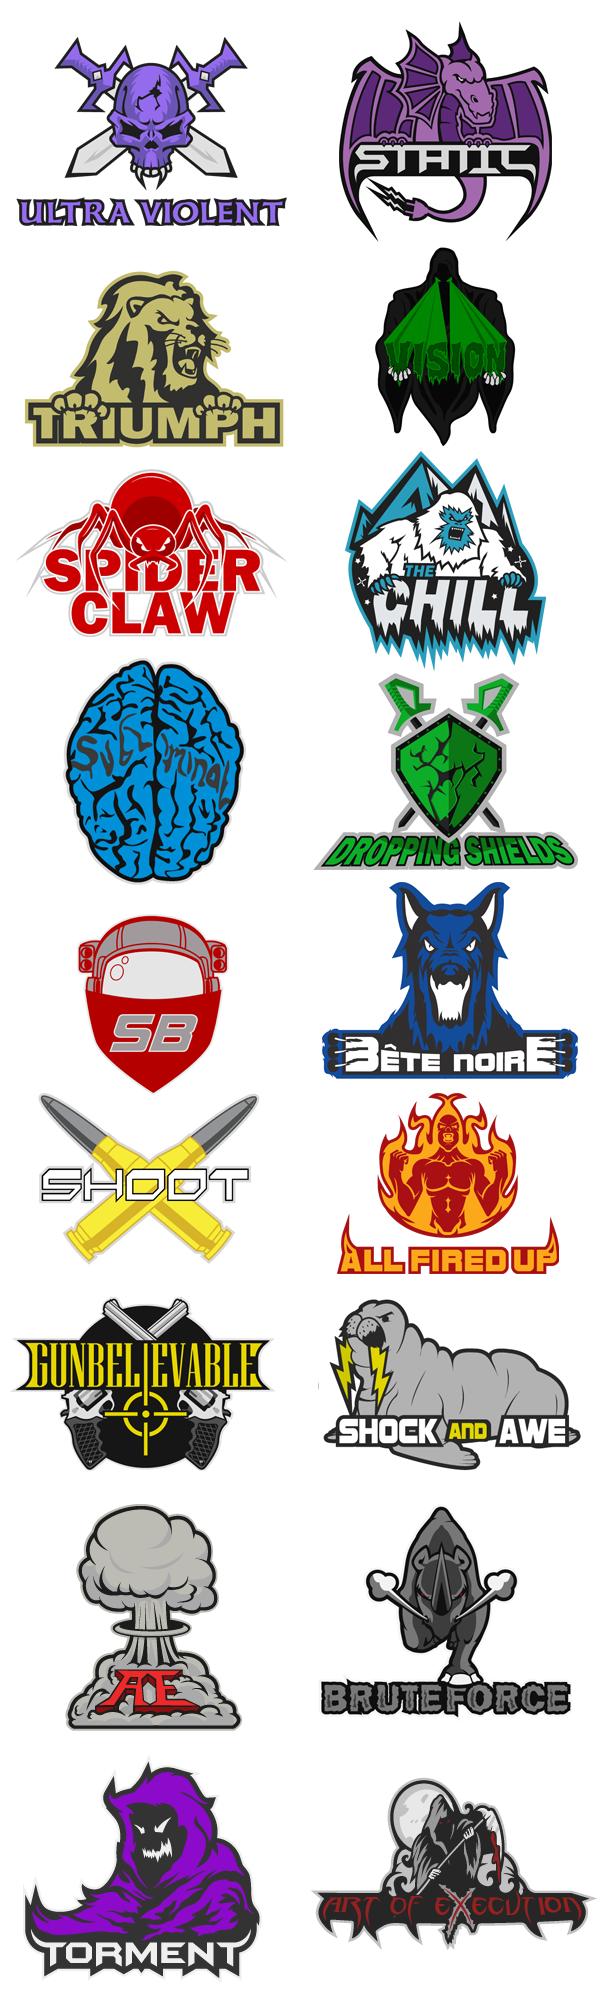 Mlg Team Logos Mlg Cod Team Logos Team Logo